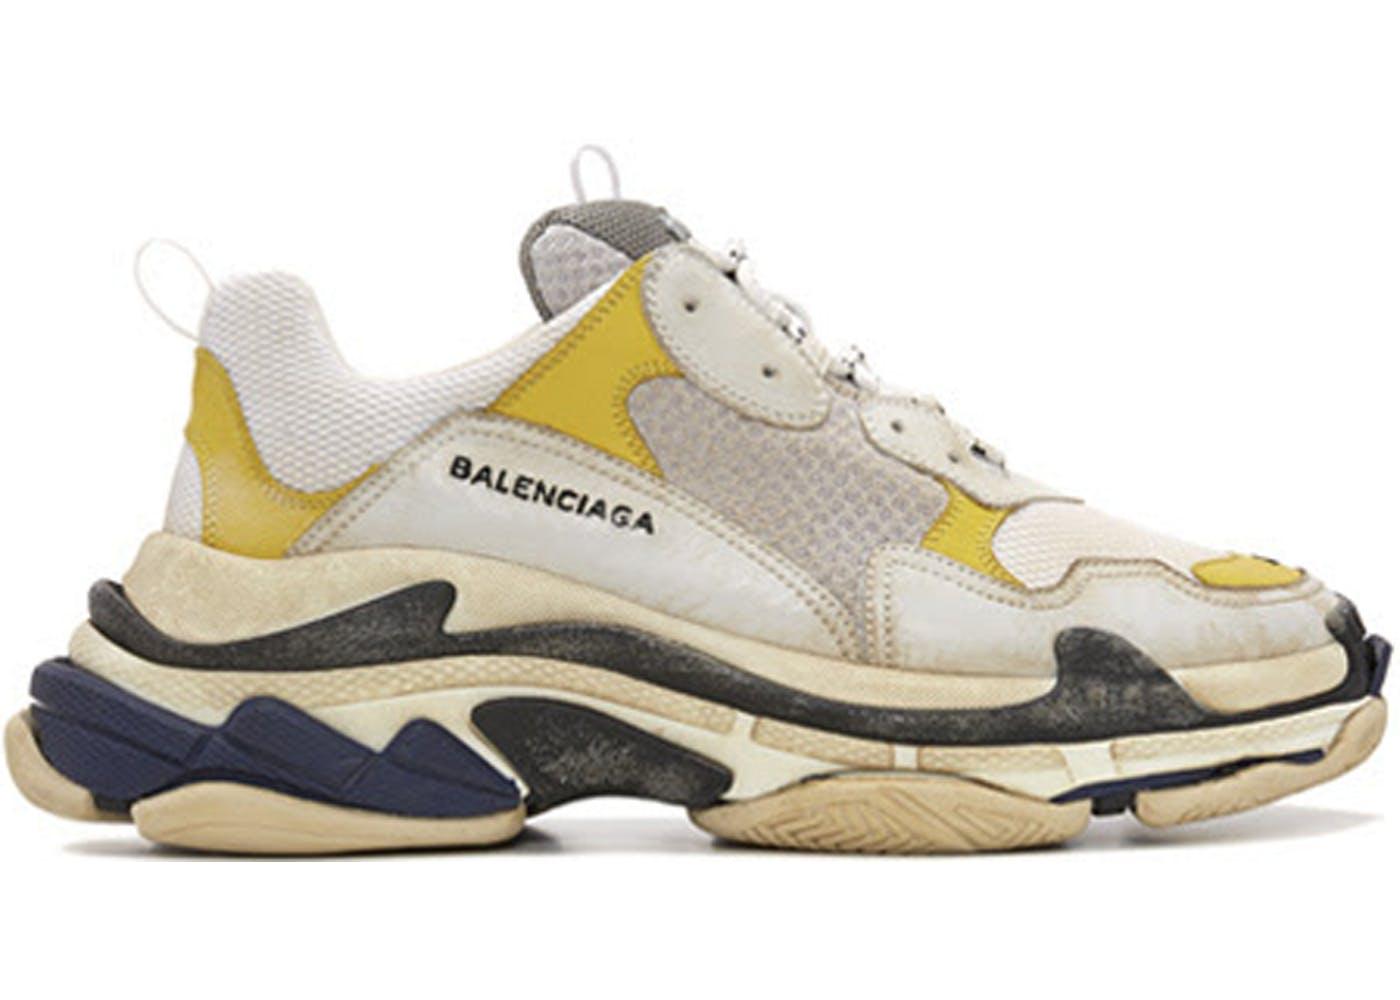 Balenciaga Triple S DSM(バレンシアガトリプルソールディーエスエム) ホワイト/イエロー-ブルー